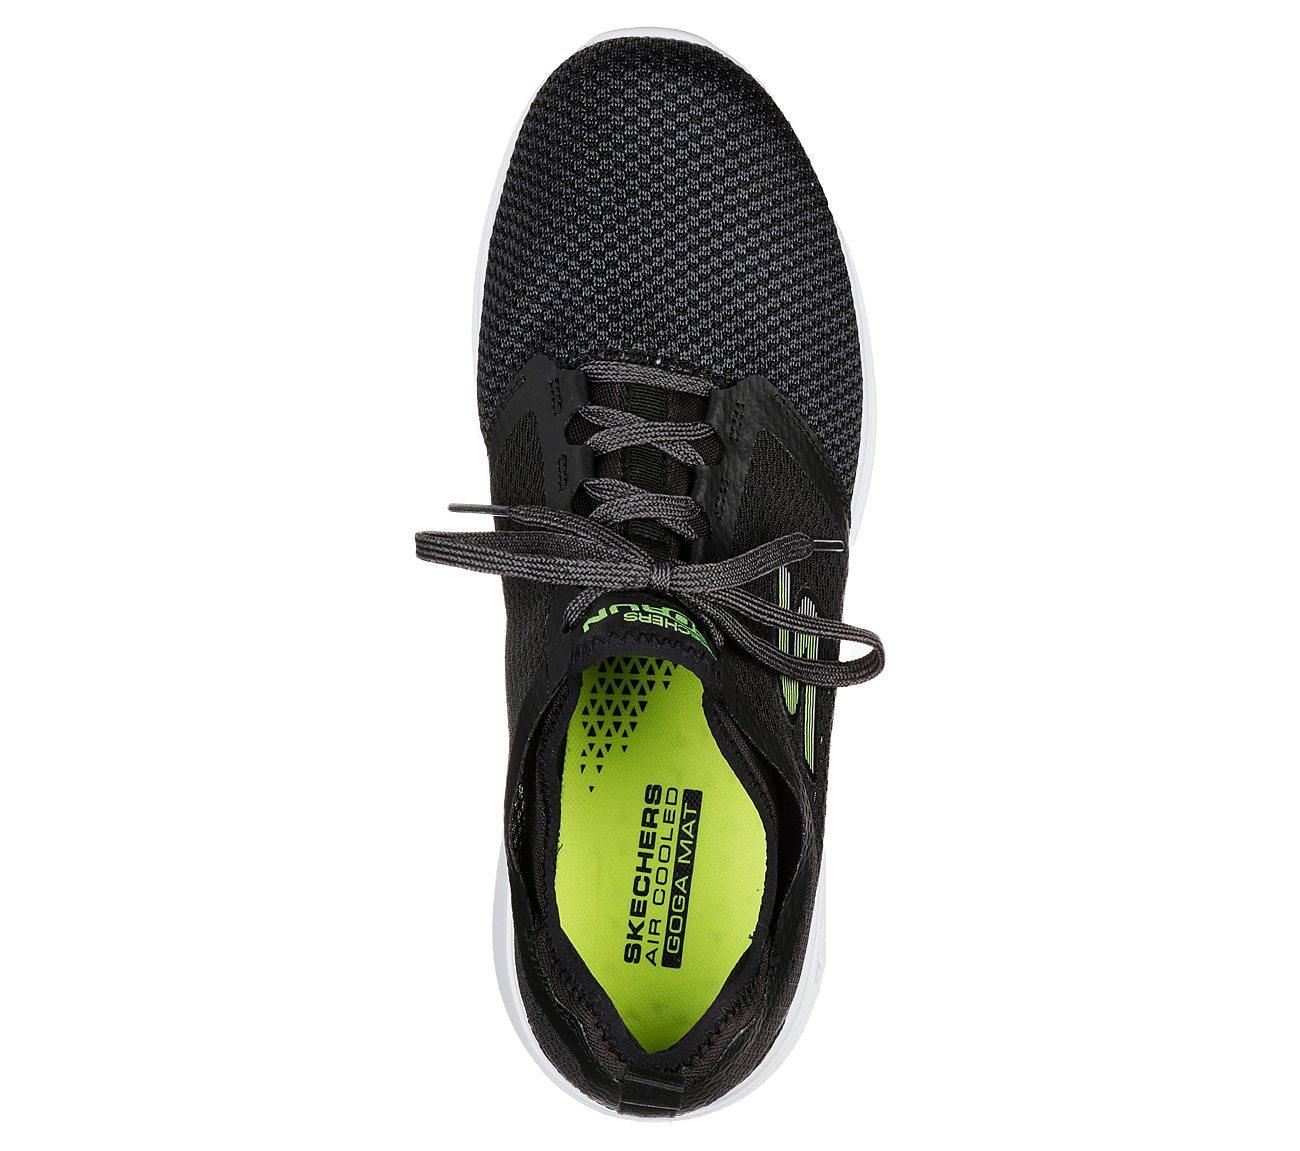 skechers goga mat tennis shoes price